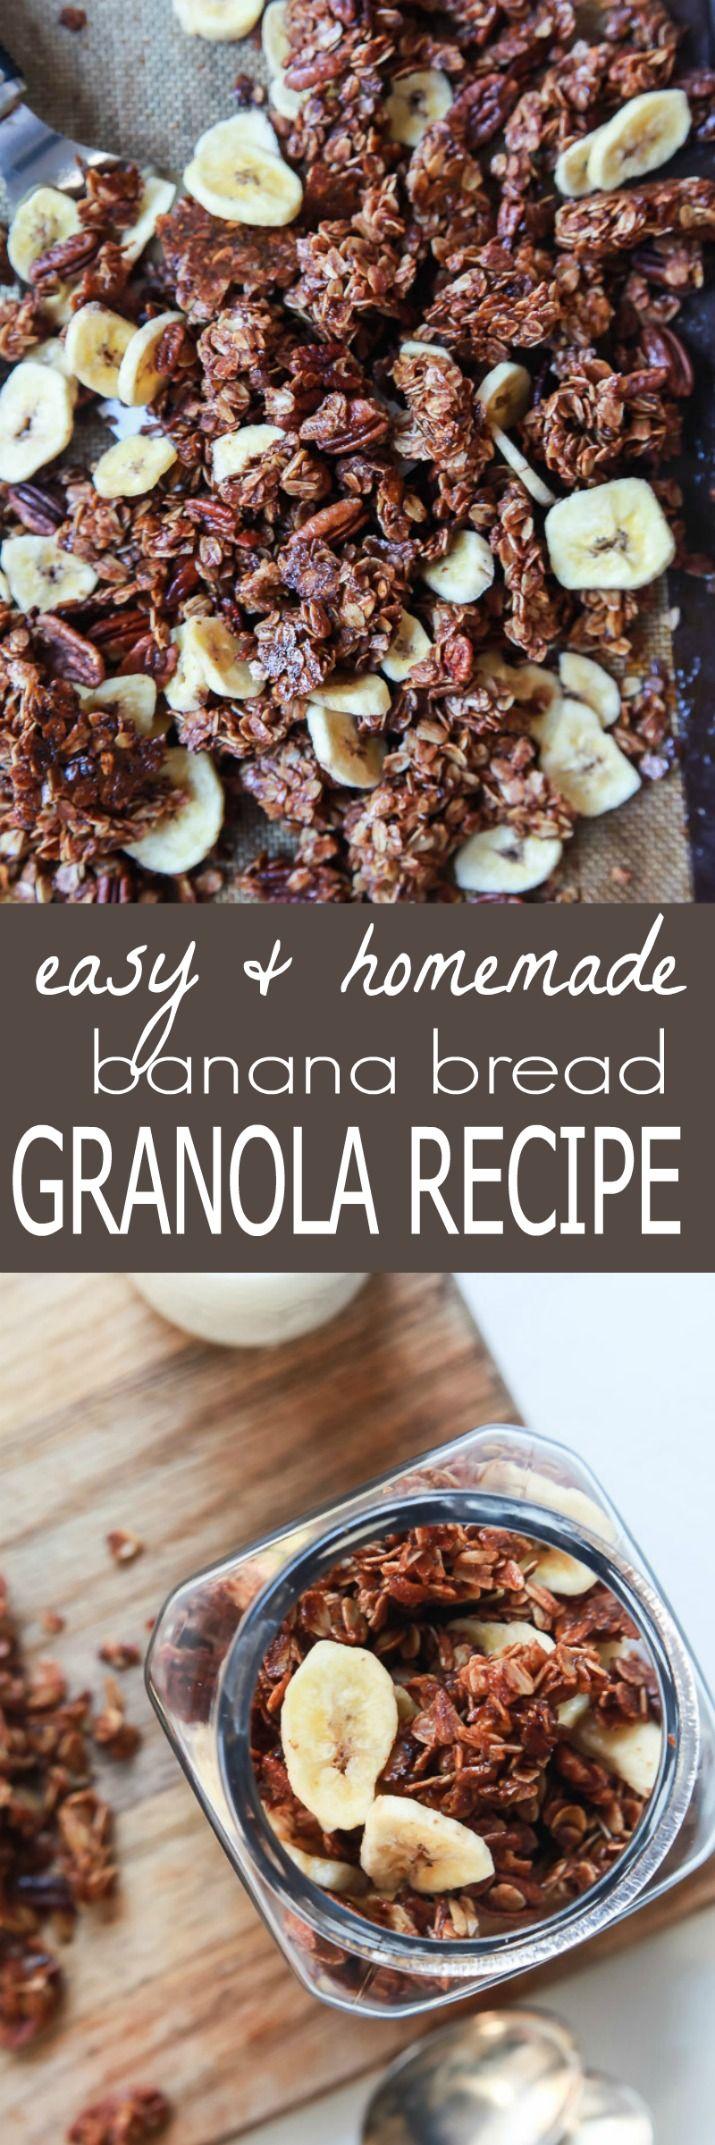 An easy Homemade Banana Bread Granola Recipe that takes 30 minutes to make and full of banana bread flavor! | joyfulhealthyeats.com